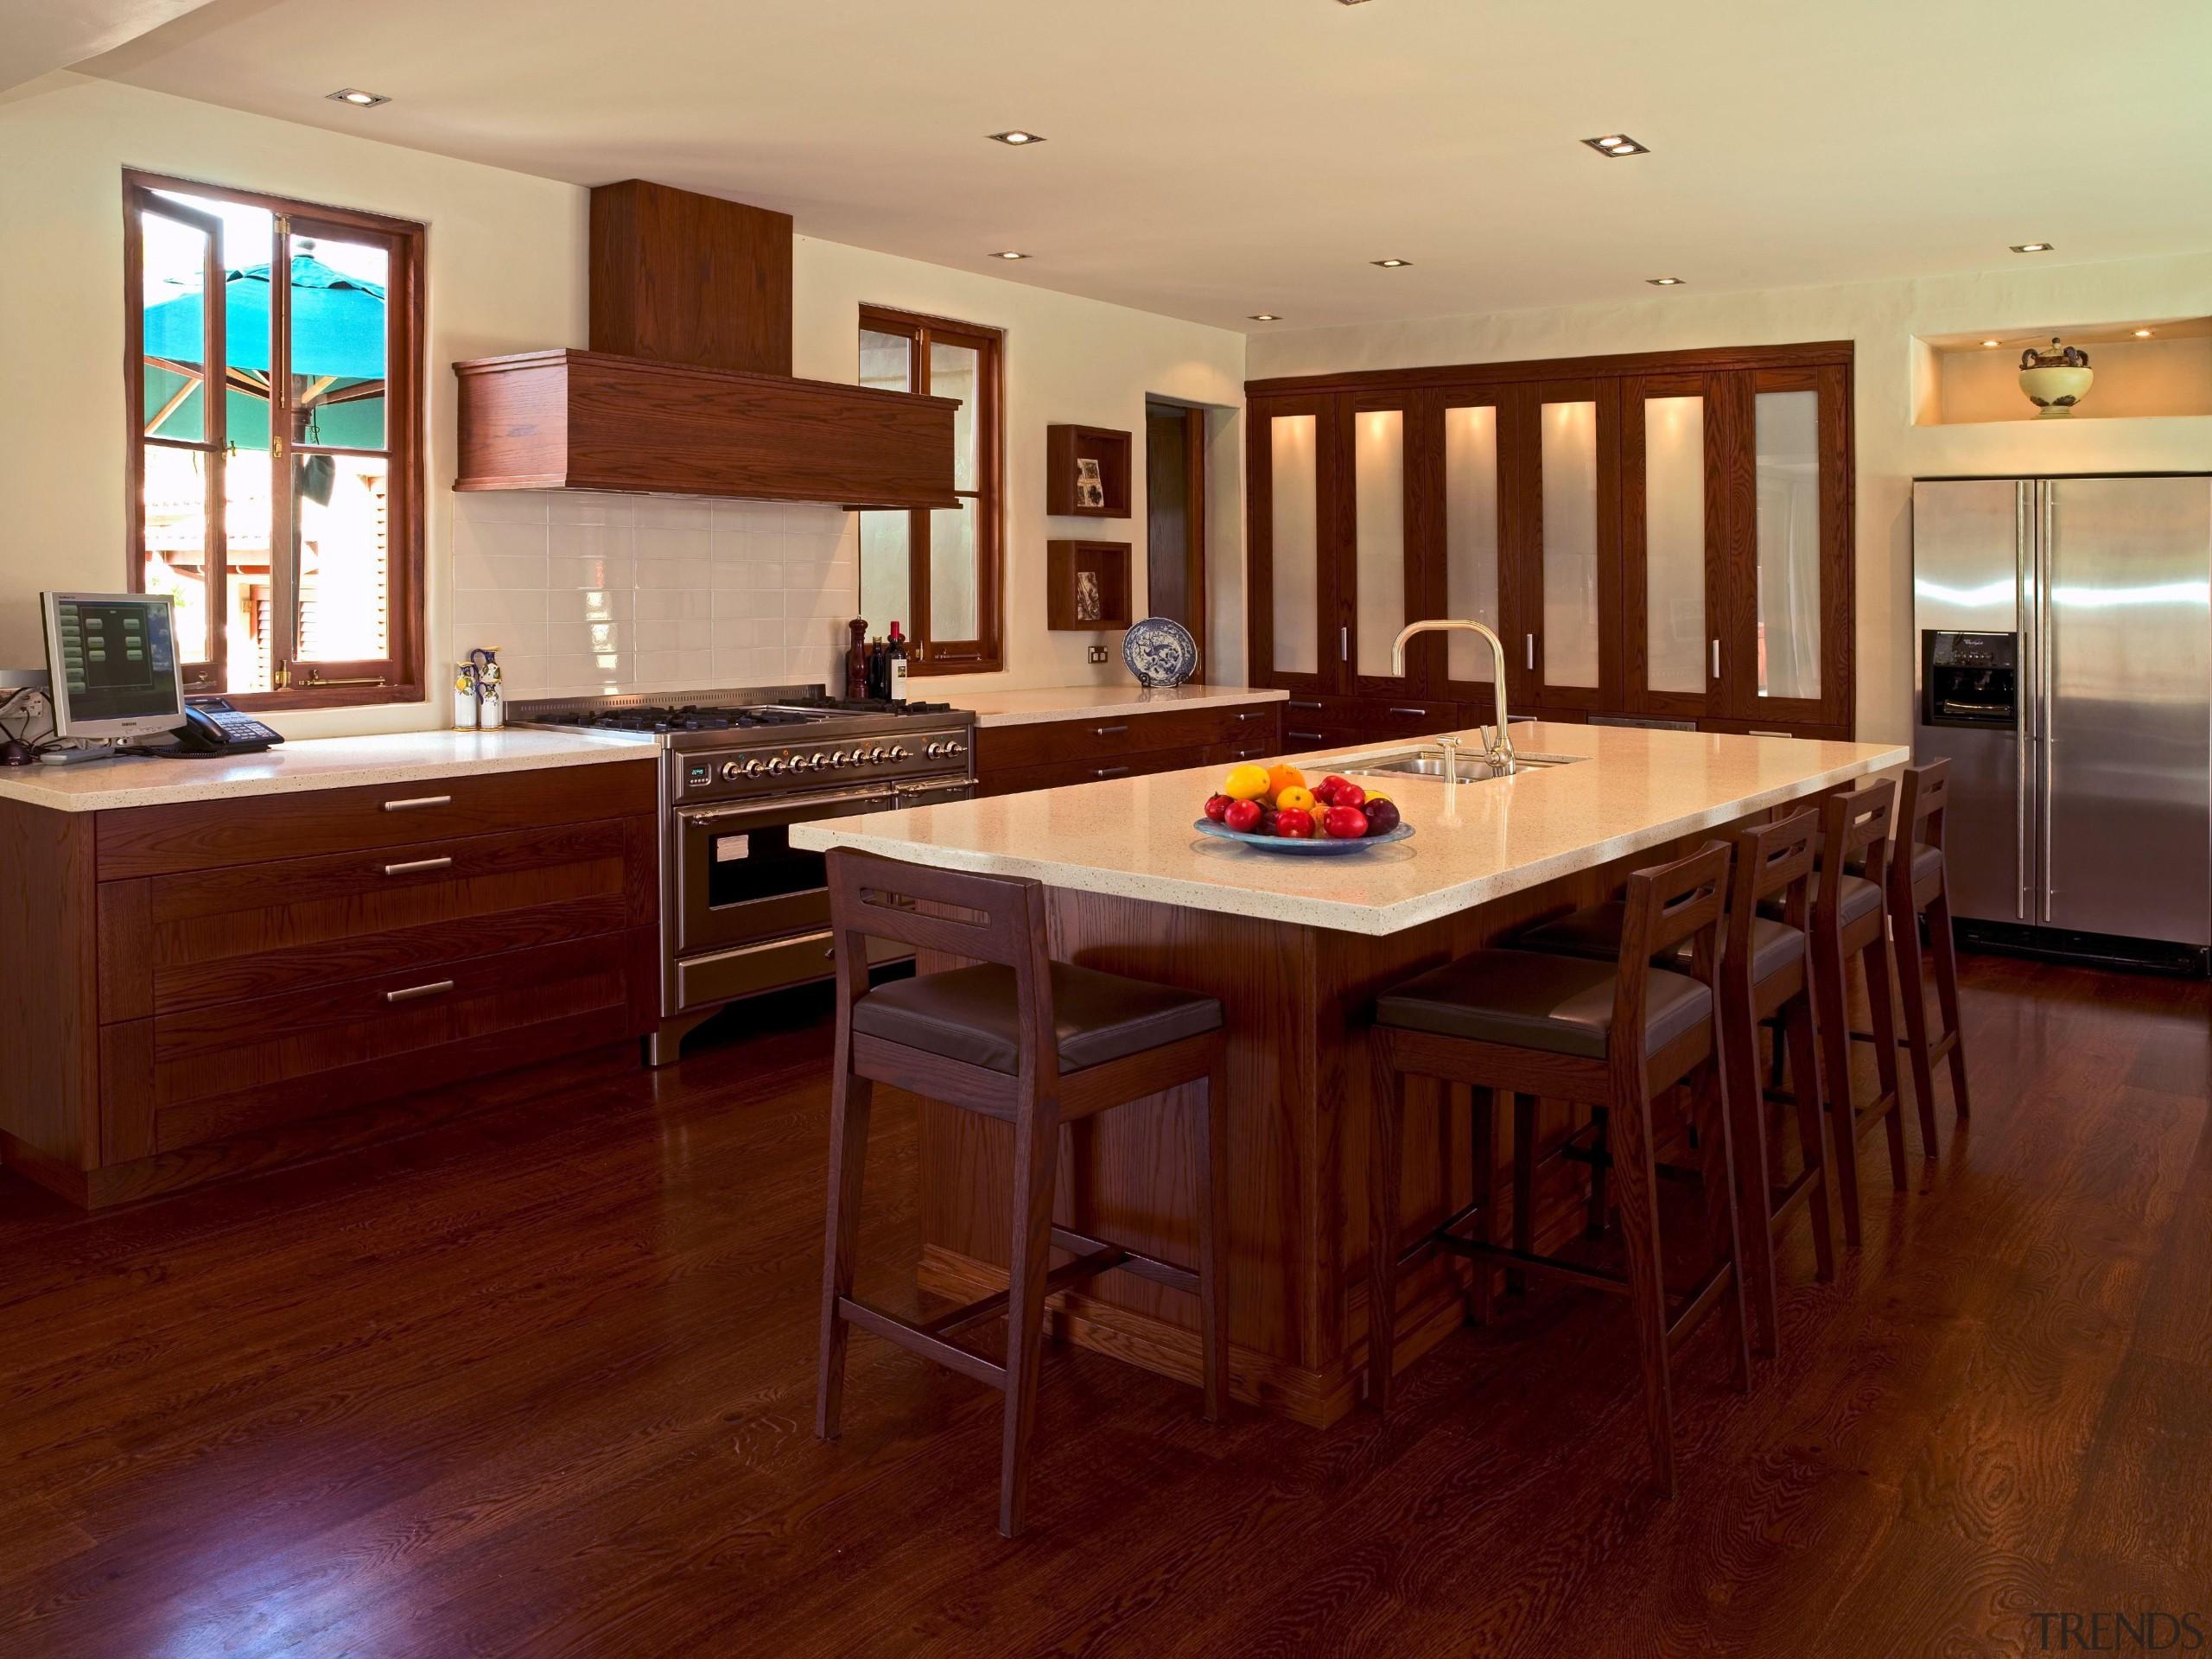 139 onetaunga kitchen - Onetaunga Kitchen - cabinetry cabinetry, countertop, cuisine classique, floor, flooring, hardwood, interior design, kitchen, laminate flooring, property, real estate, room, wood, wood flooring, red, orange